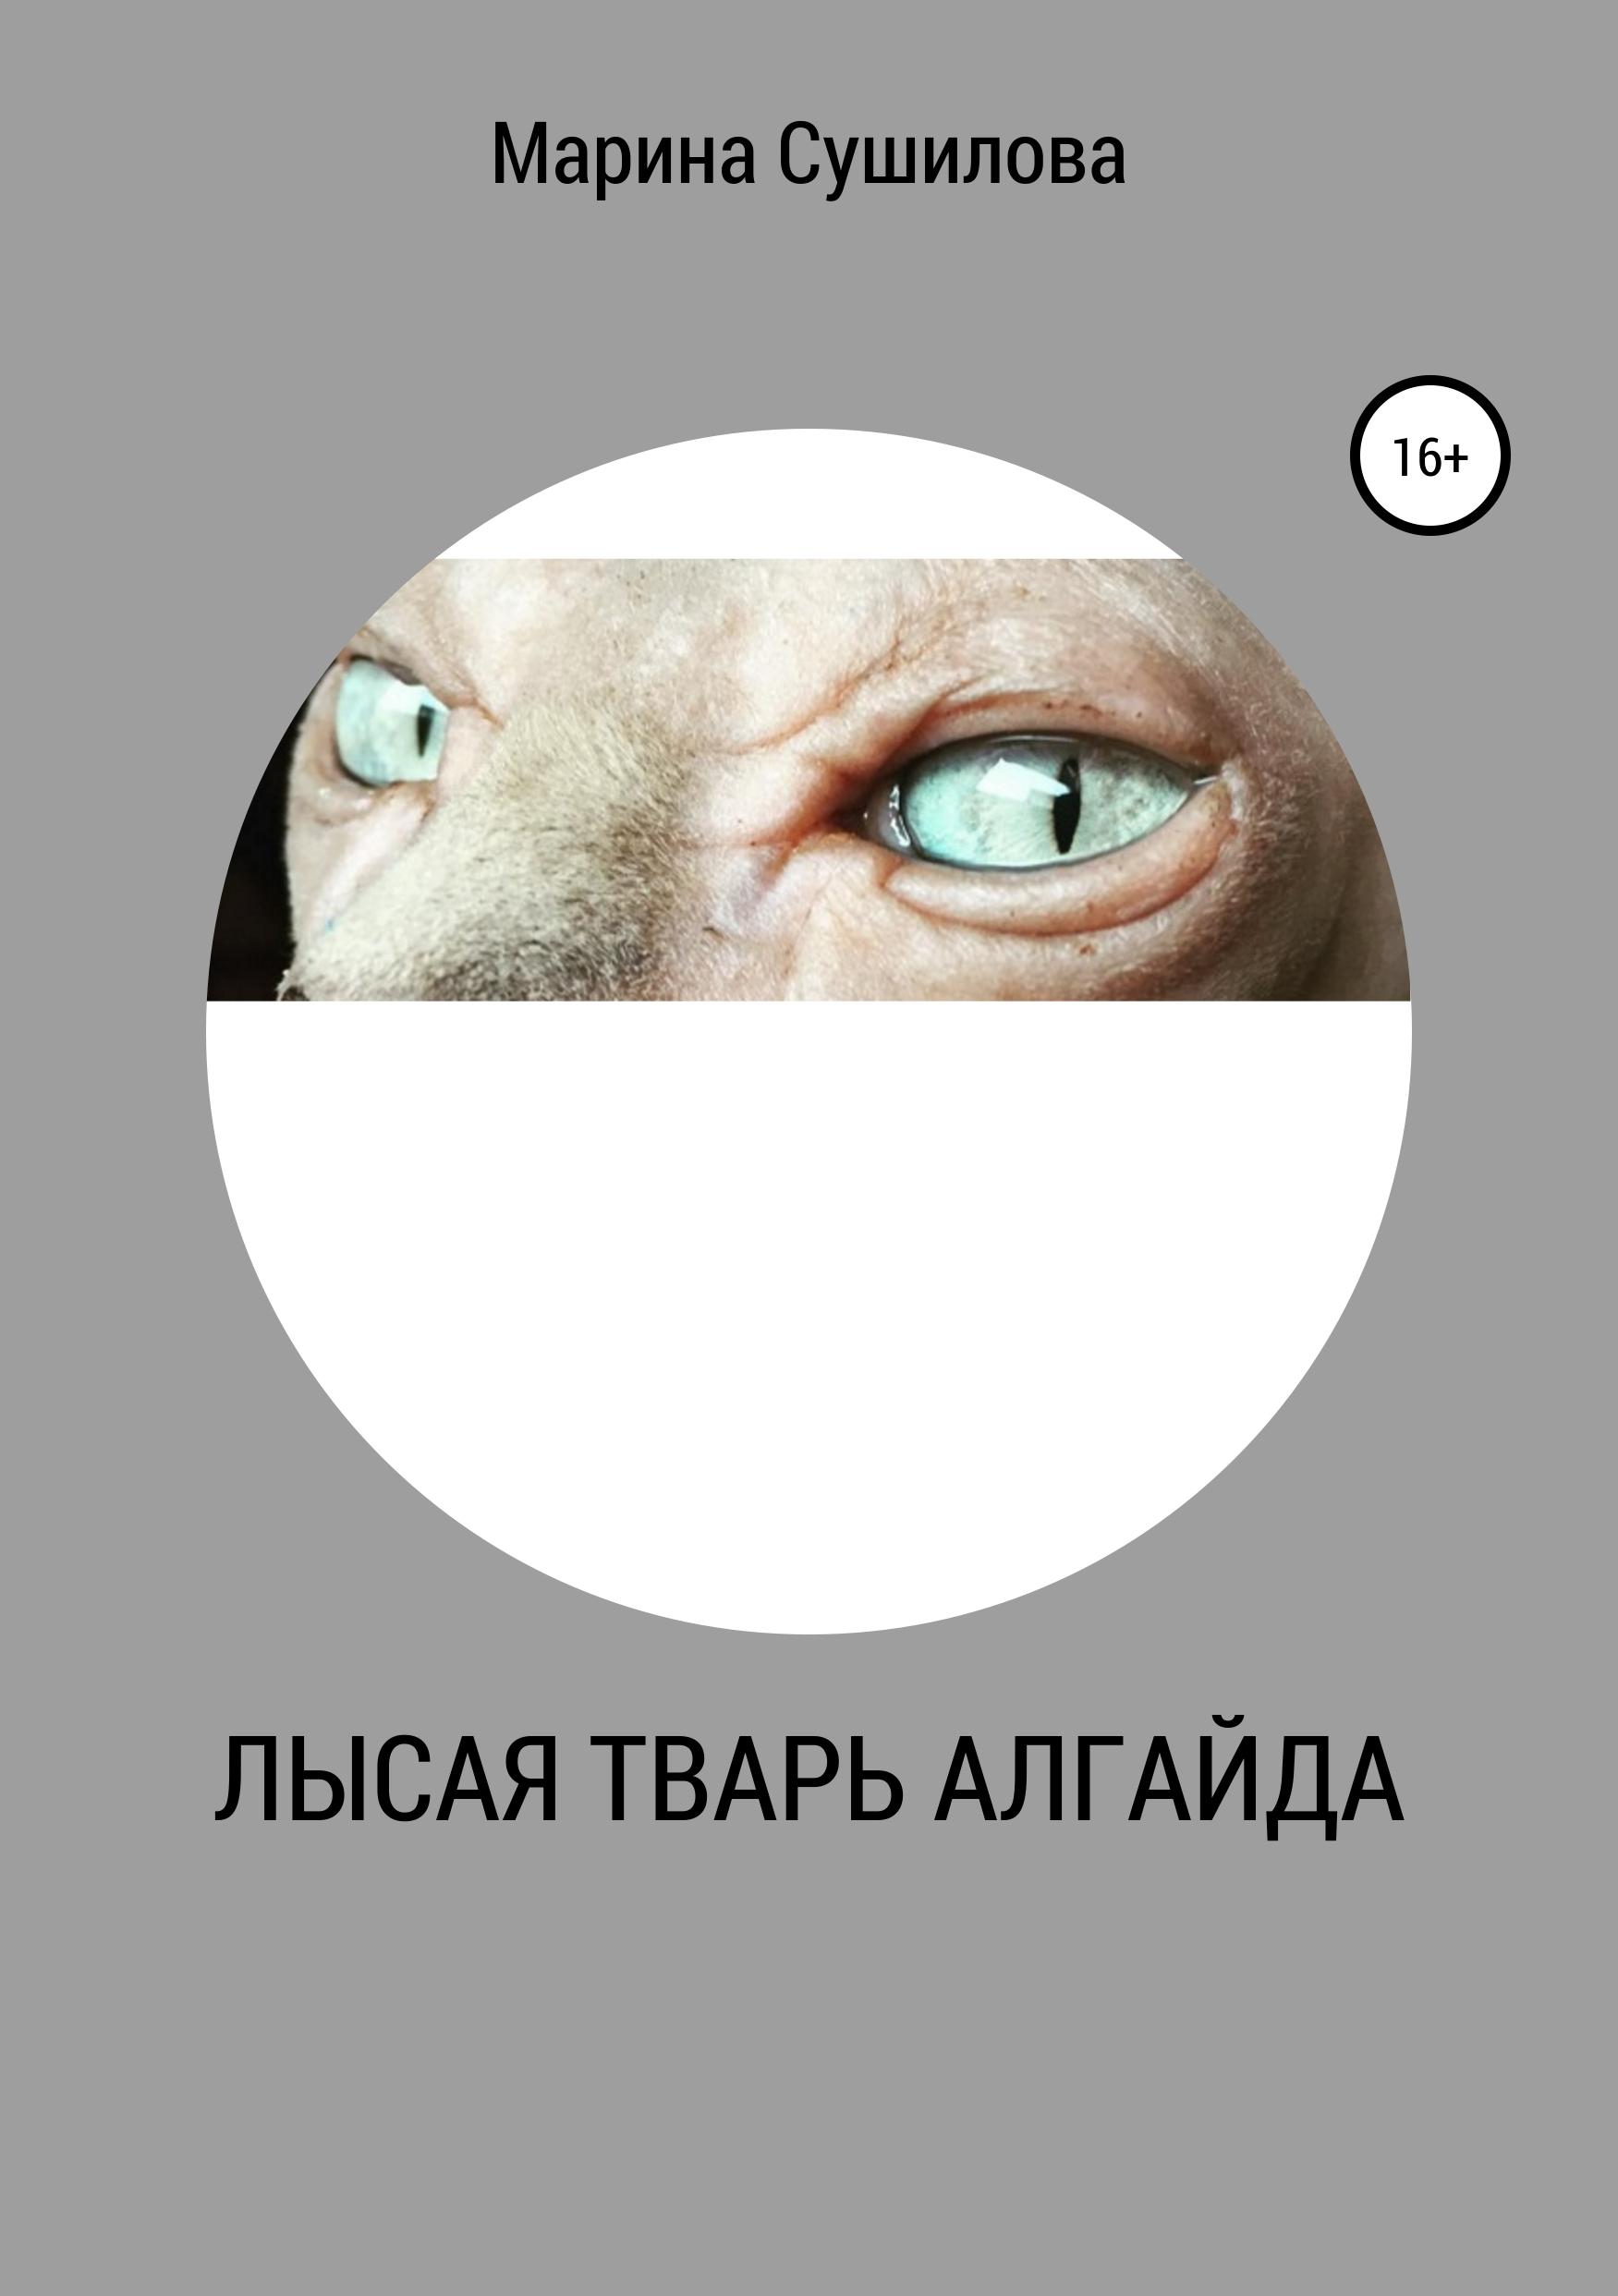 Марина Сушилова - Лысая тварь Алгайда